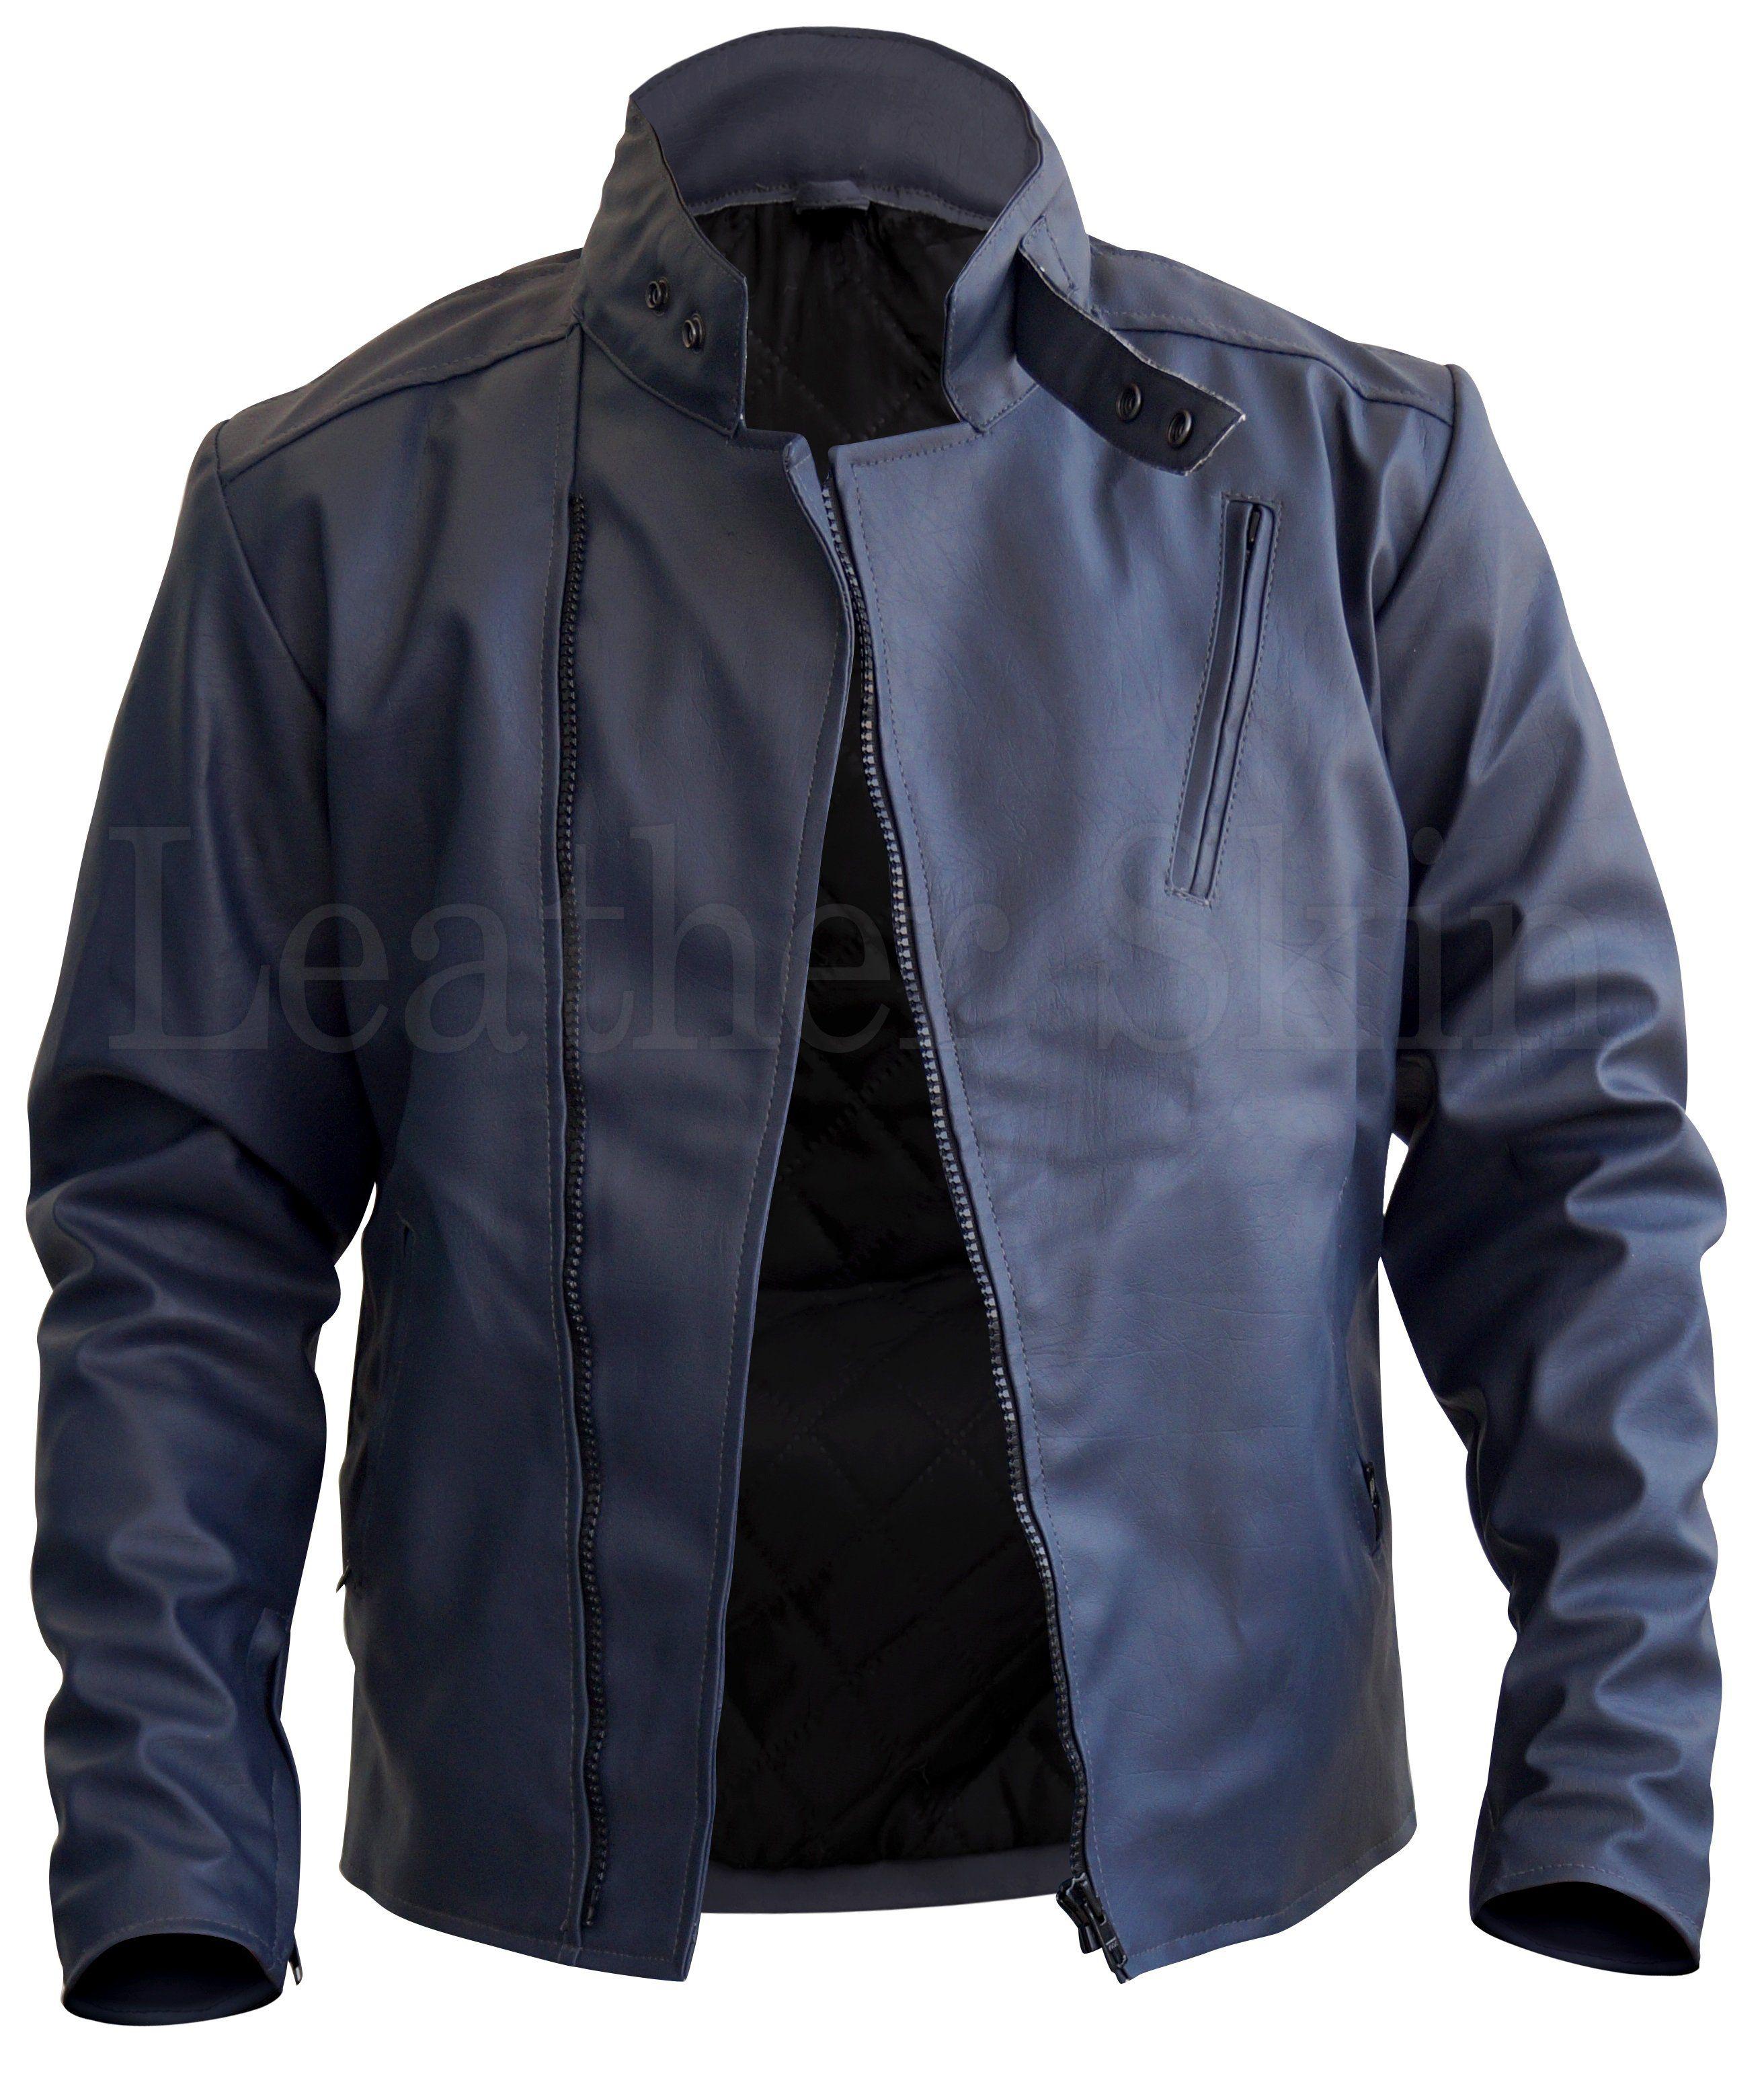 Men Bluish Gray Faux Leather Jacket 3xl Leather Jacket Faux Leather Jackets Leather Jacket Men [ 3088 x 2624 Pixel ]